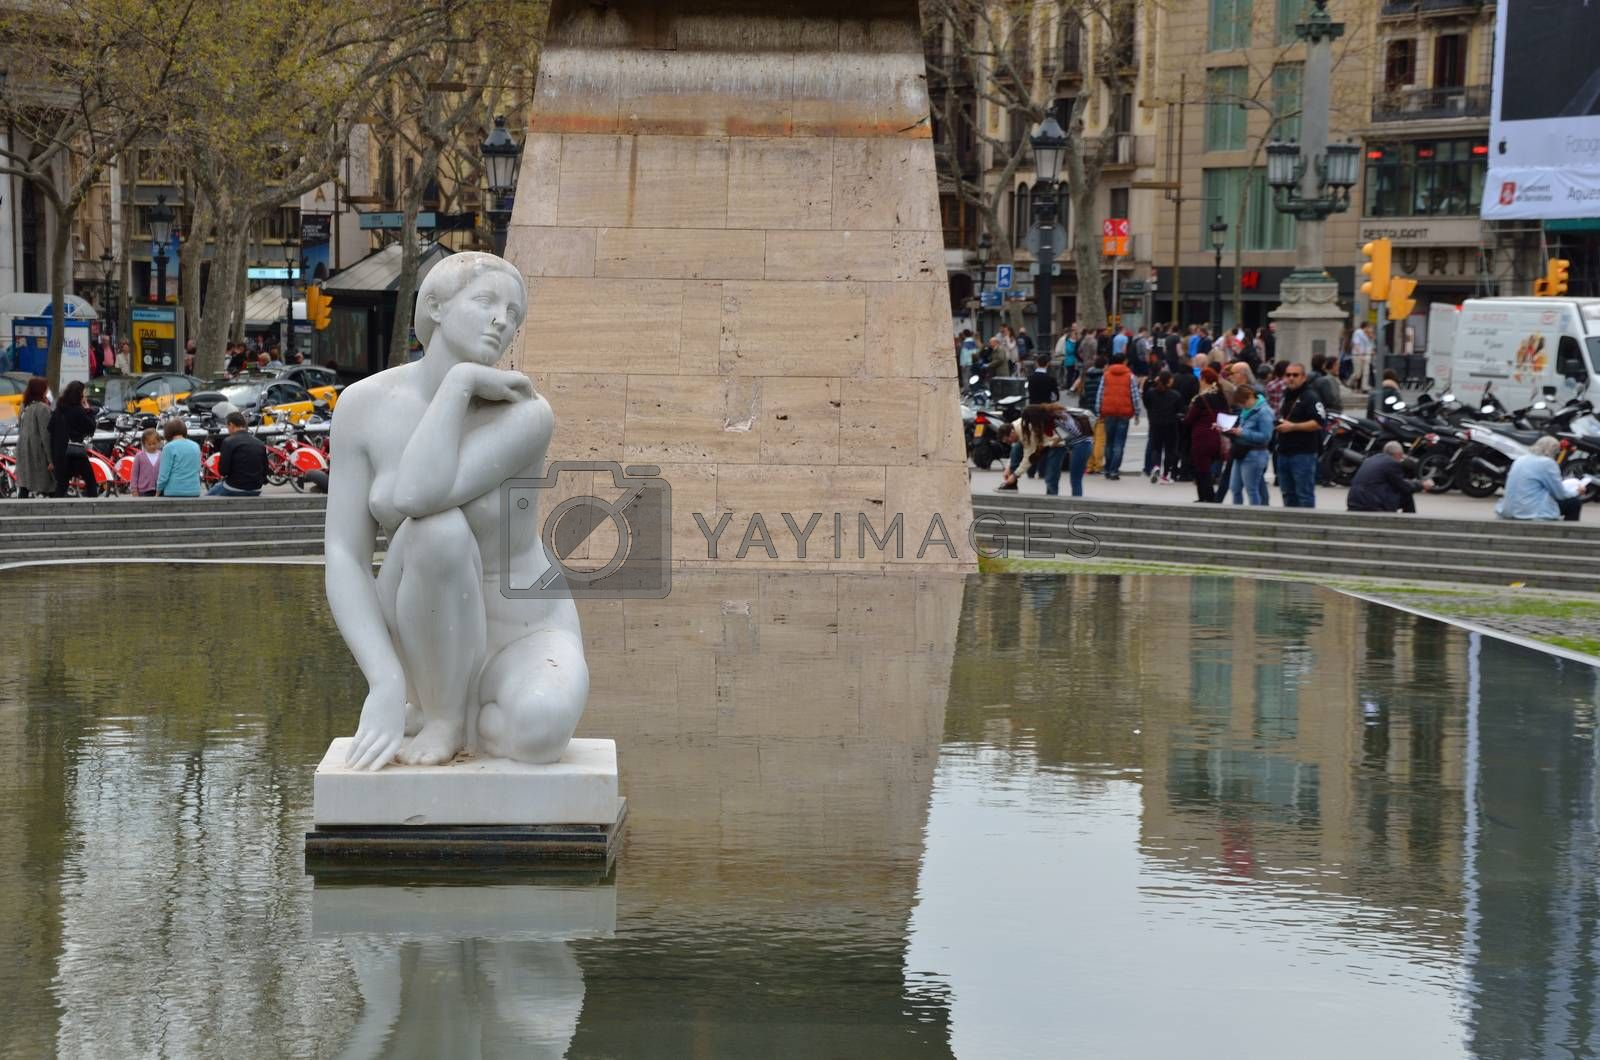 beautiful fountain with female figure in Barcelona